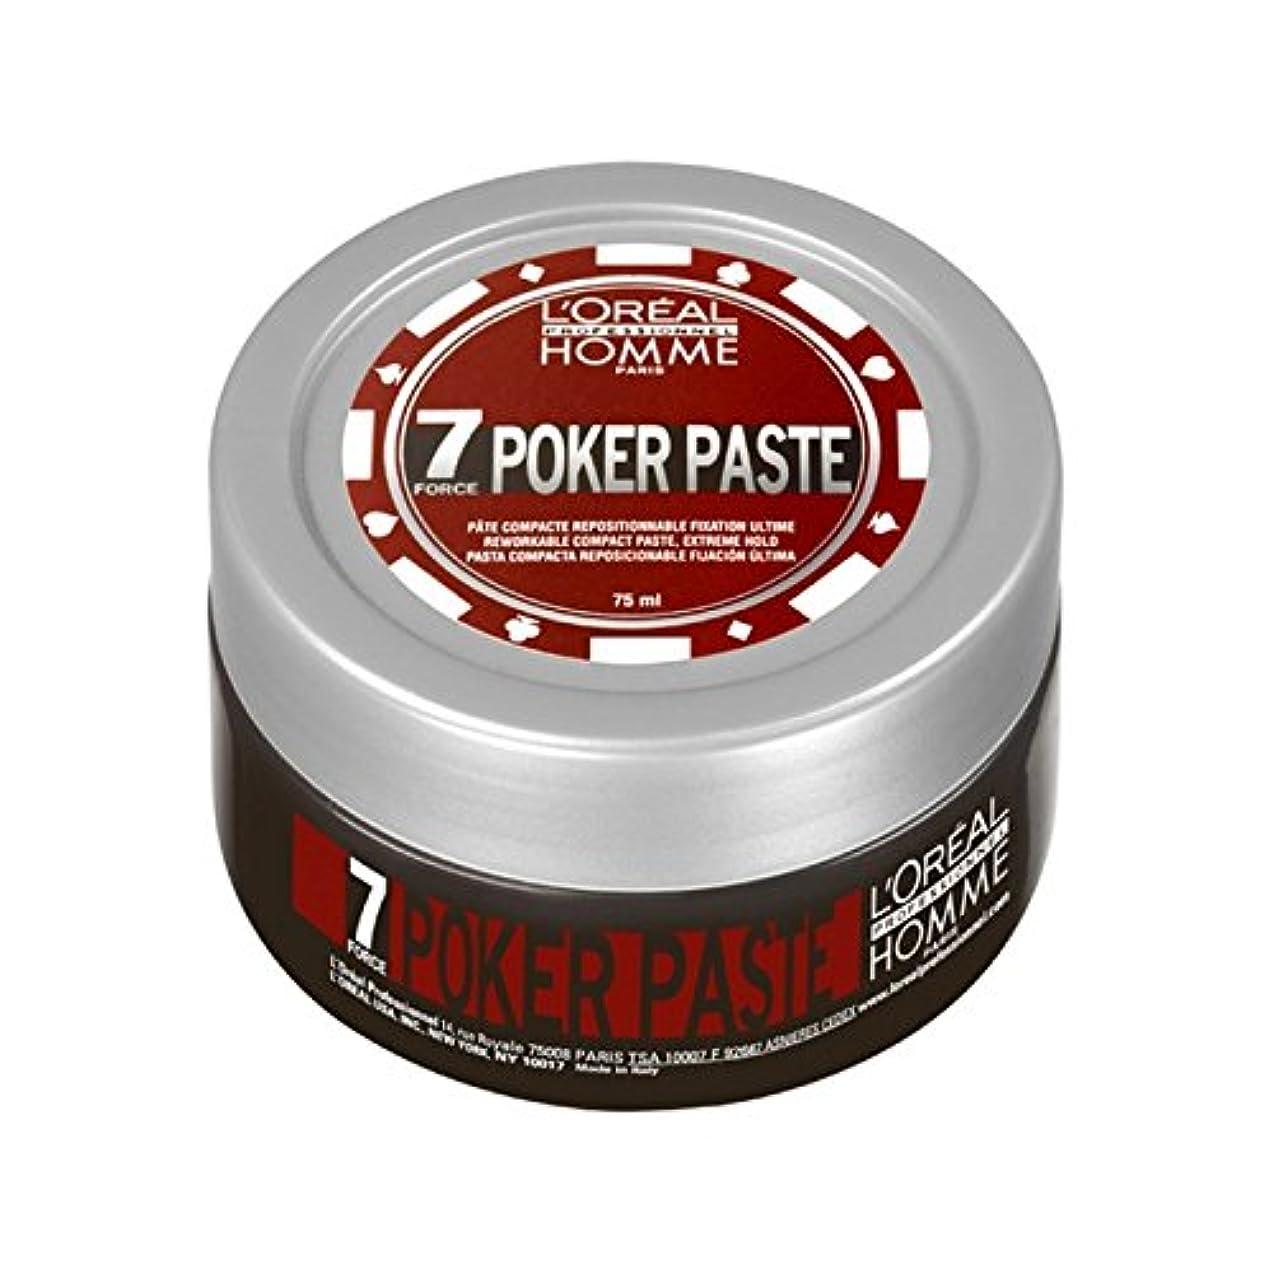 L'Oreal Professional Homme Poker Paste (75ml) - ロレアルプロオムポーカーペースト(75ミリリットル) [並行輸入品]